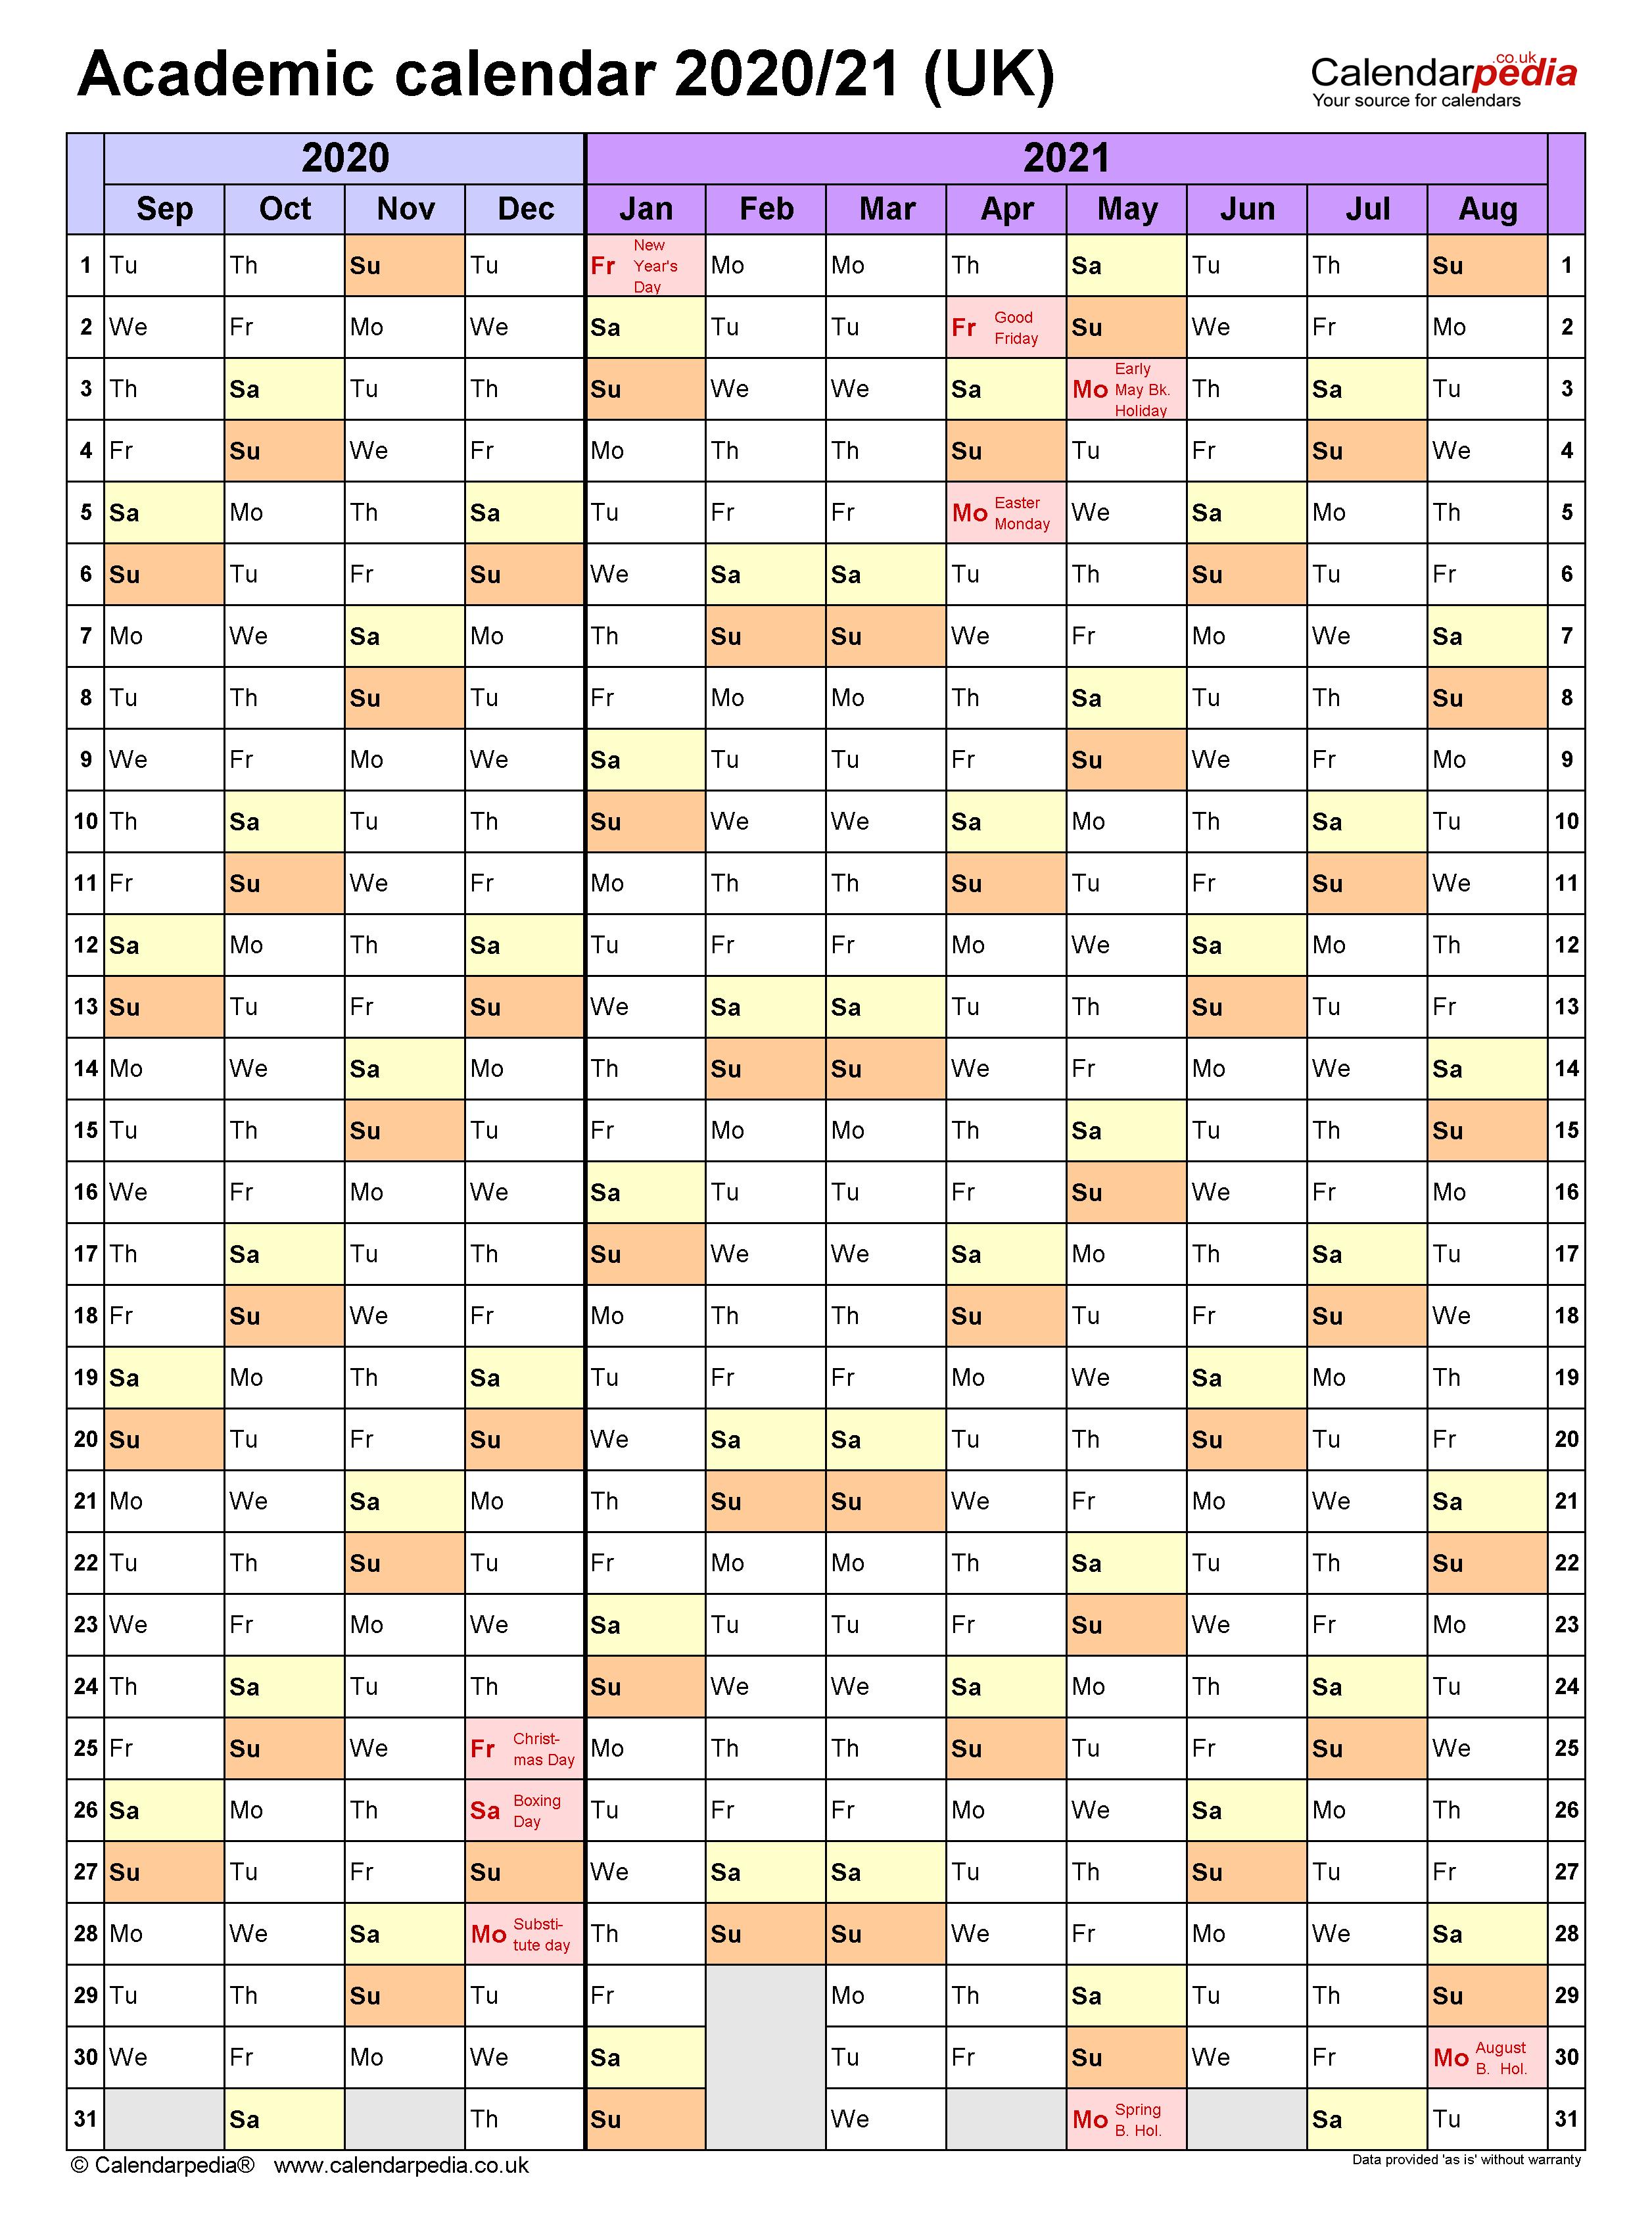 Academic Calendars 2020/21 Uk - Free Printable Word Templates For Colorado Springs District 20 2021 20 School Calendar